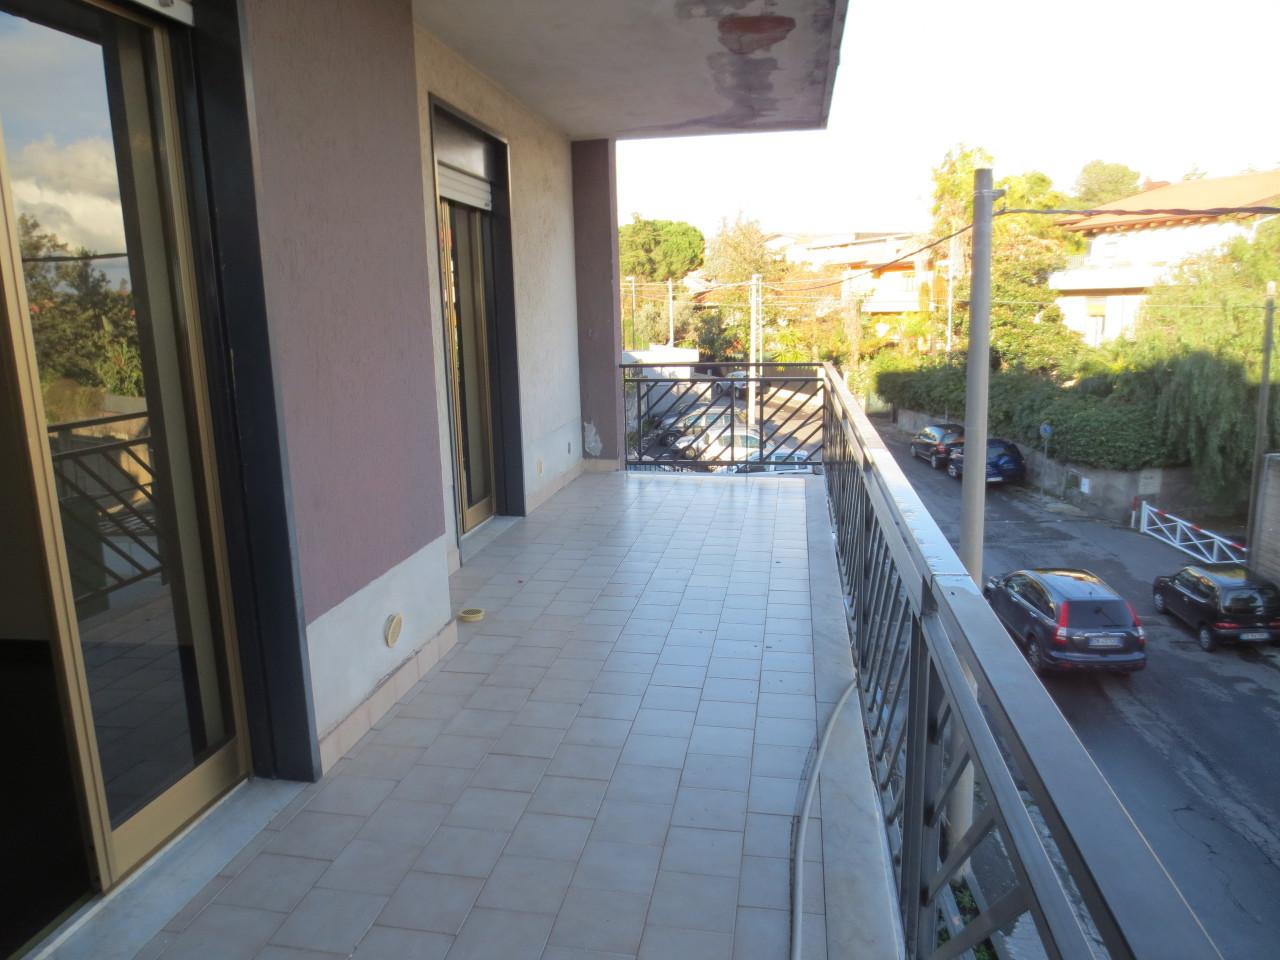 Bilocale Gravina di Catania Via Salvatore Seminara 12 5